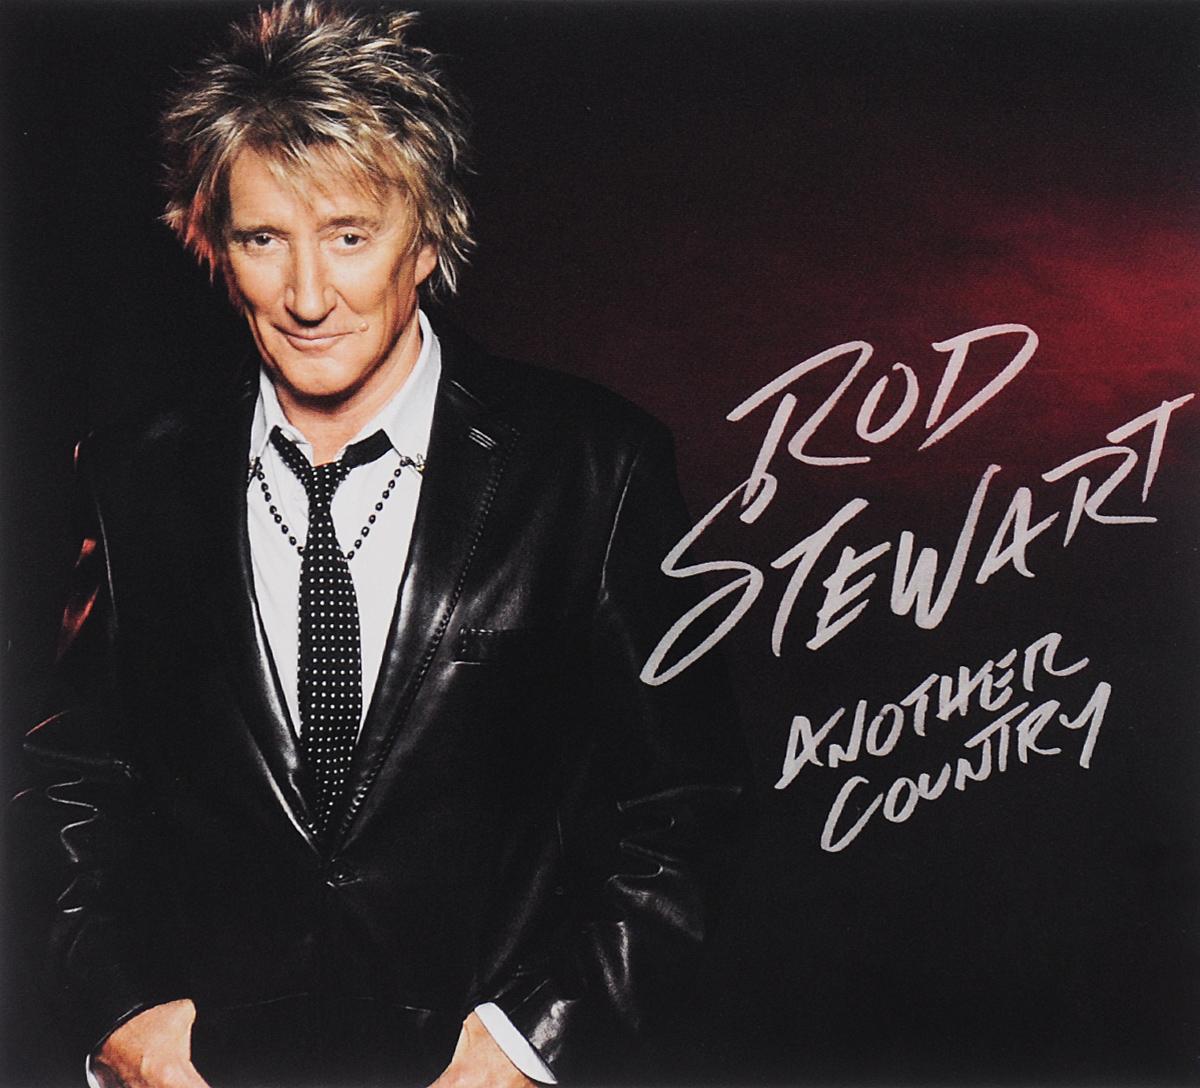 Род Стюарт Rod Stewart. Another Country rod stewart toronto